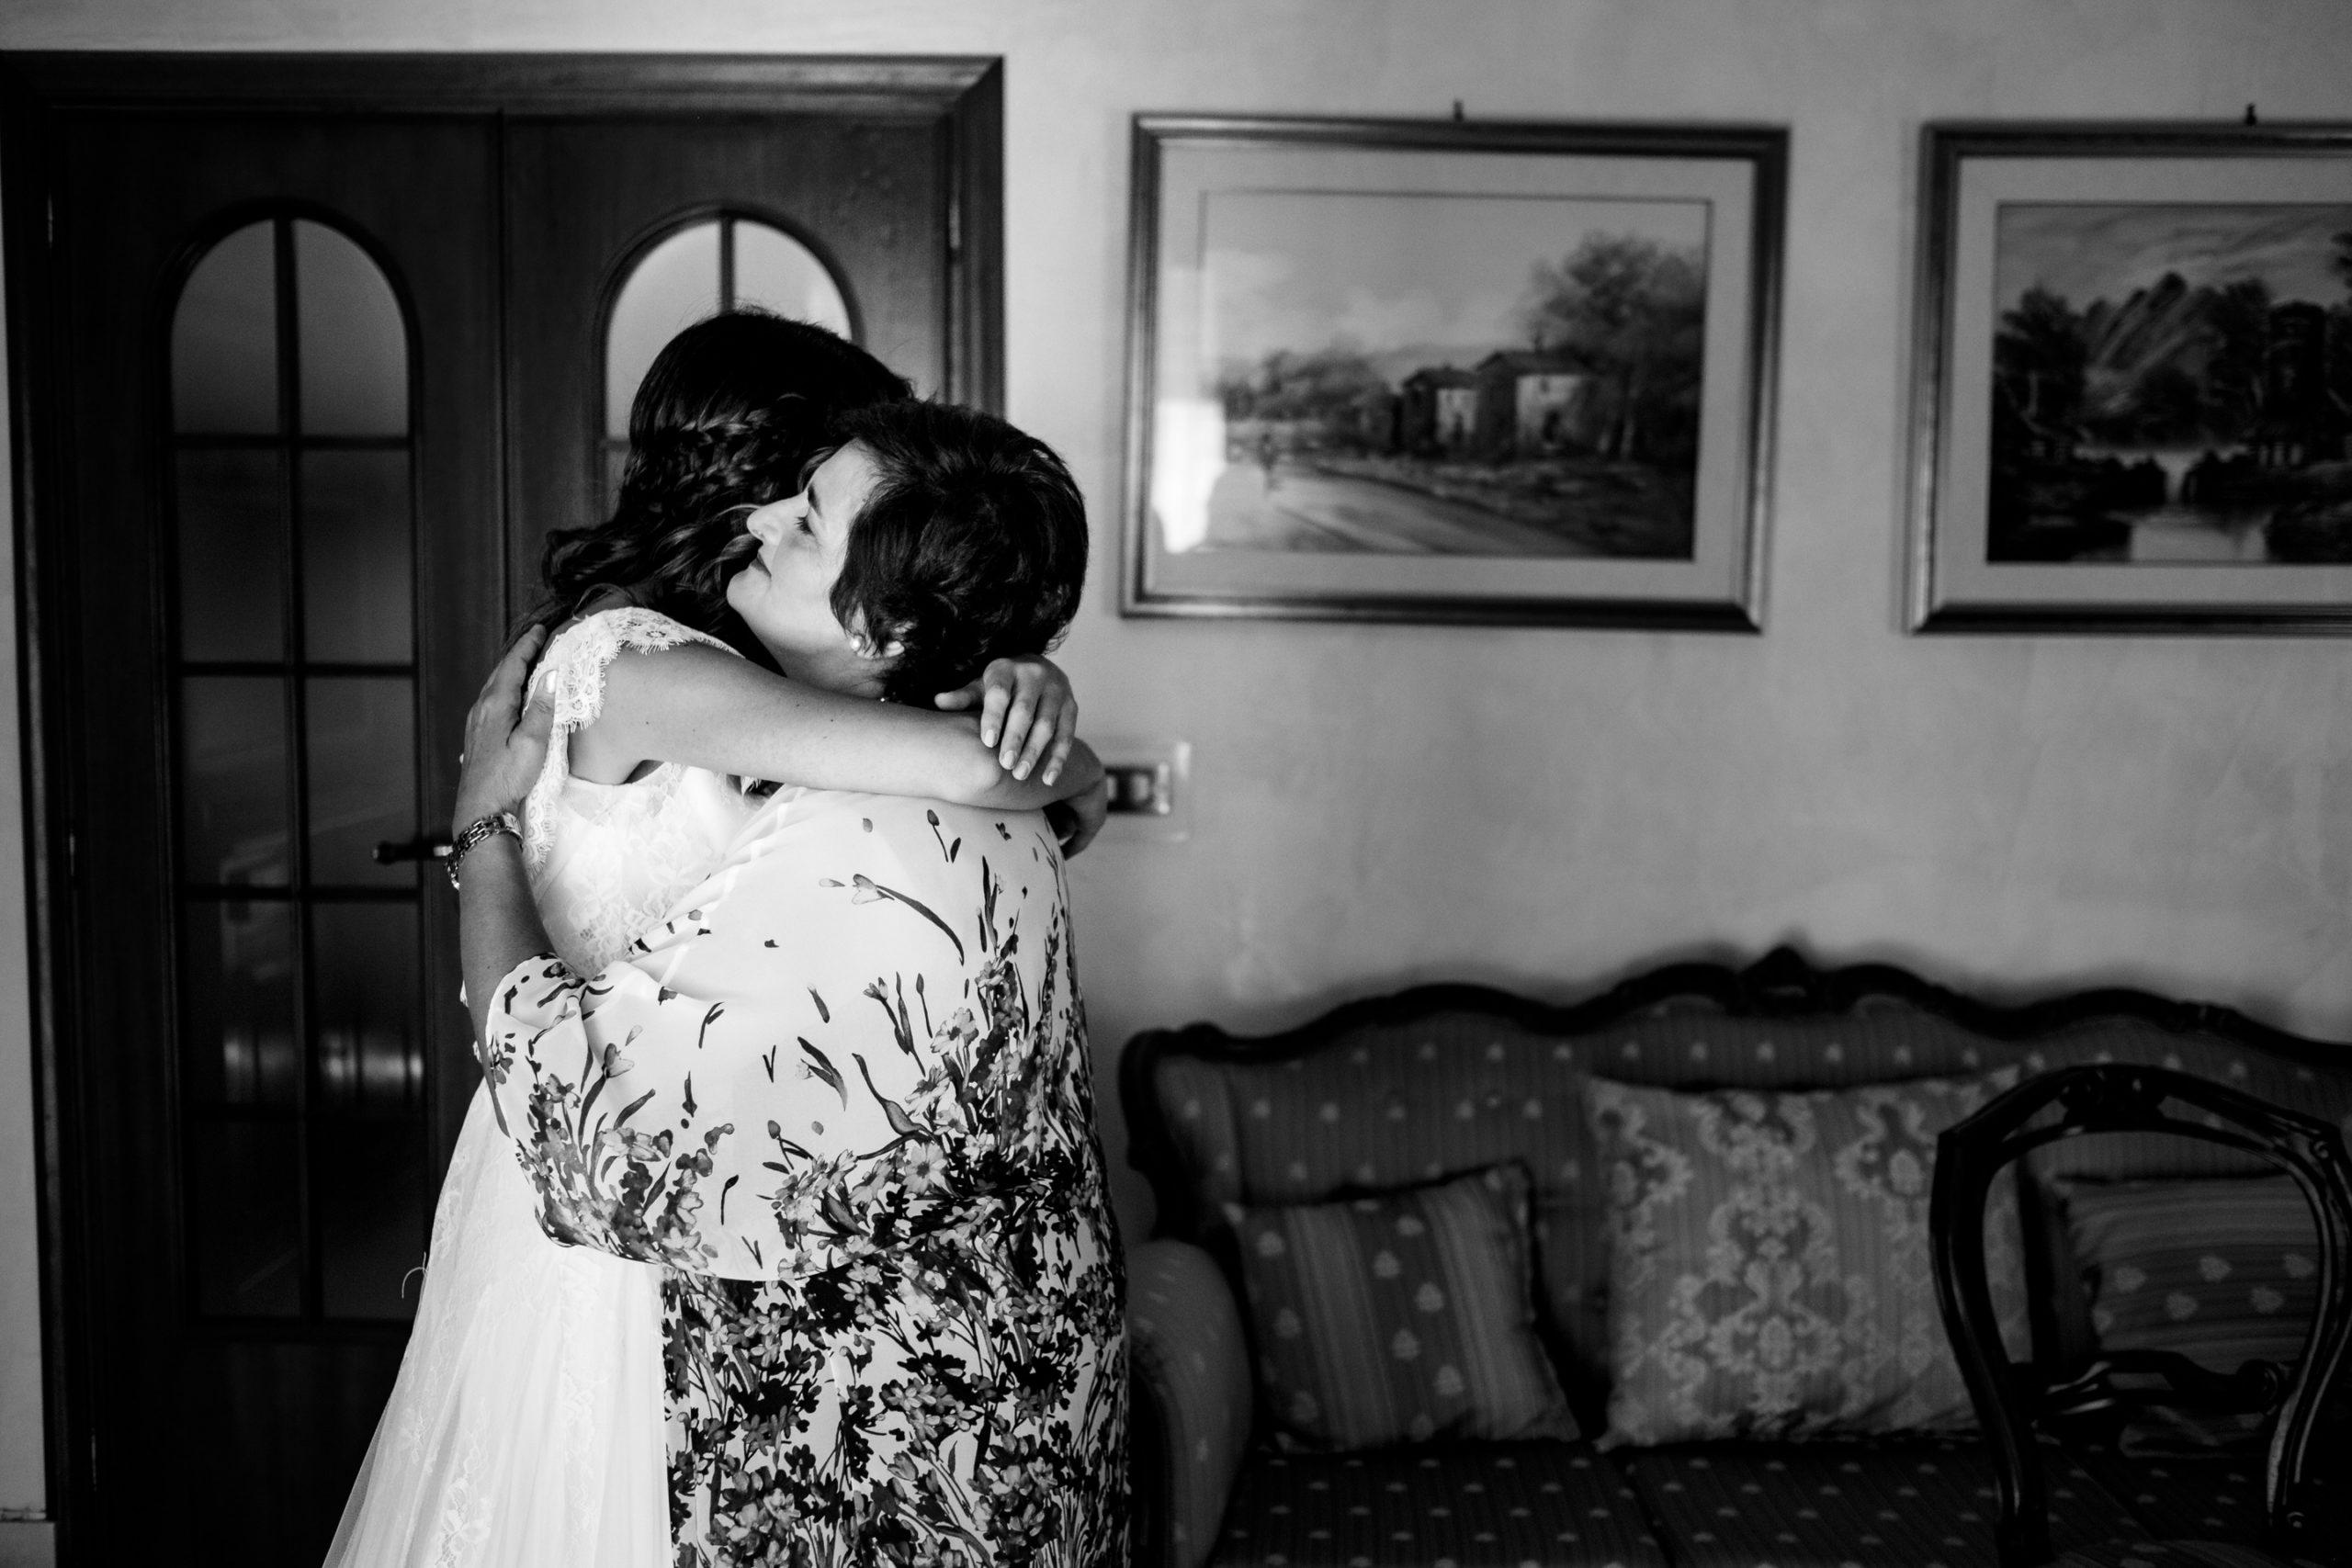 Bride Hug With Her Mother